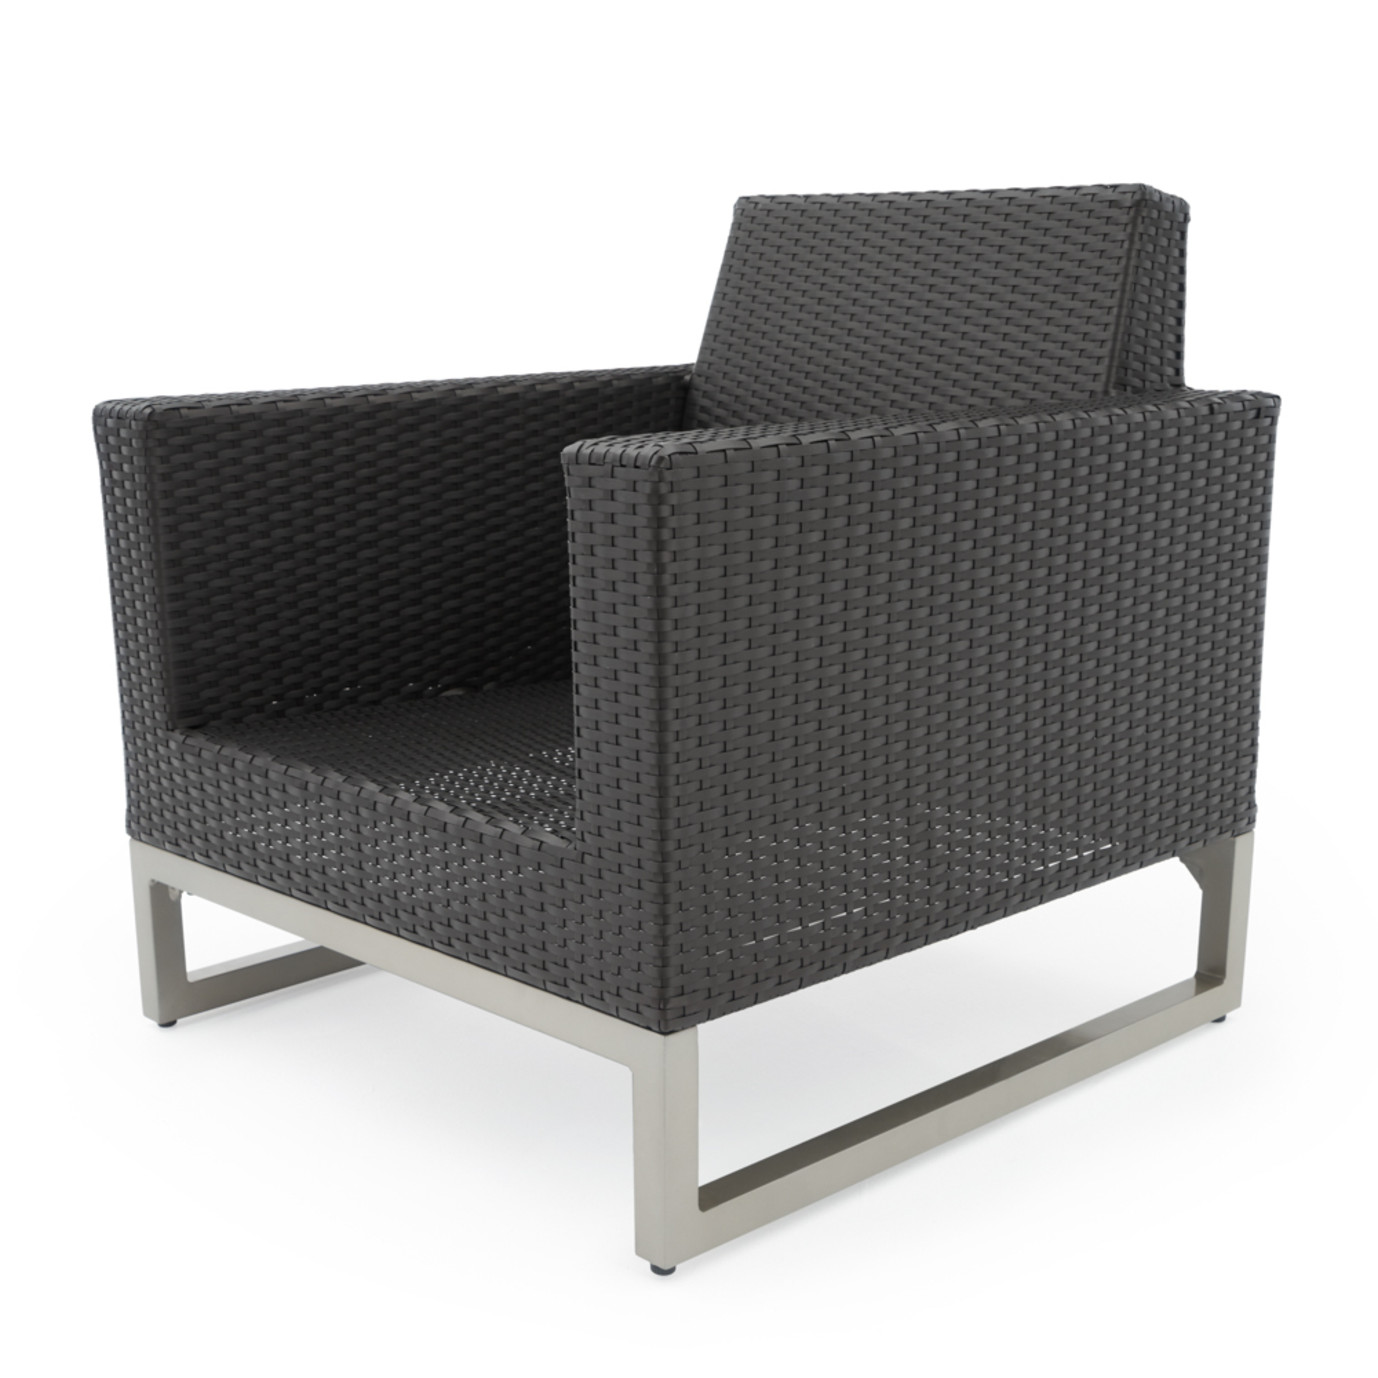 Milo™ Espresso 7pc Deep Seating Set -Slate Gray